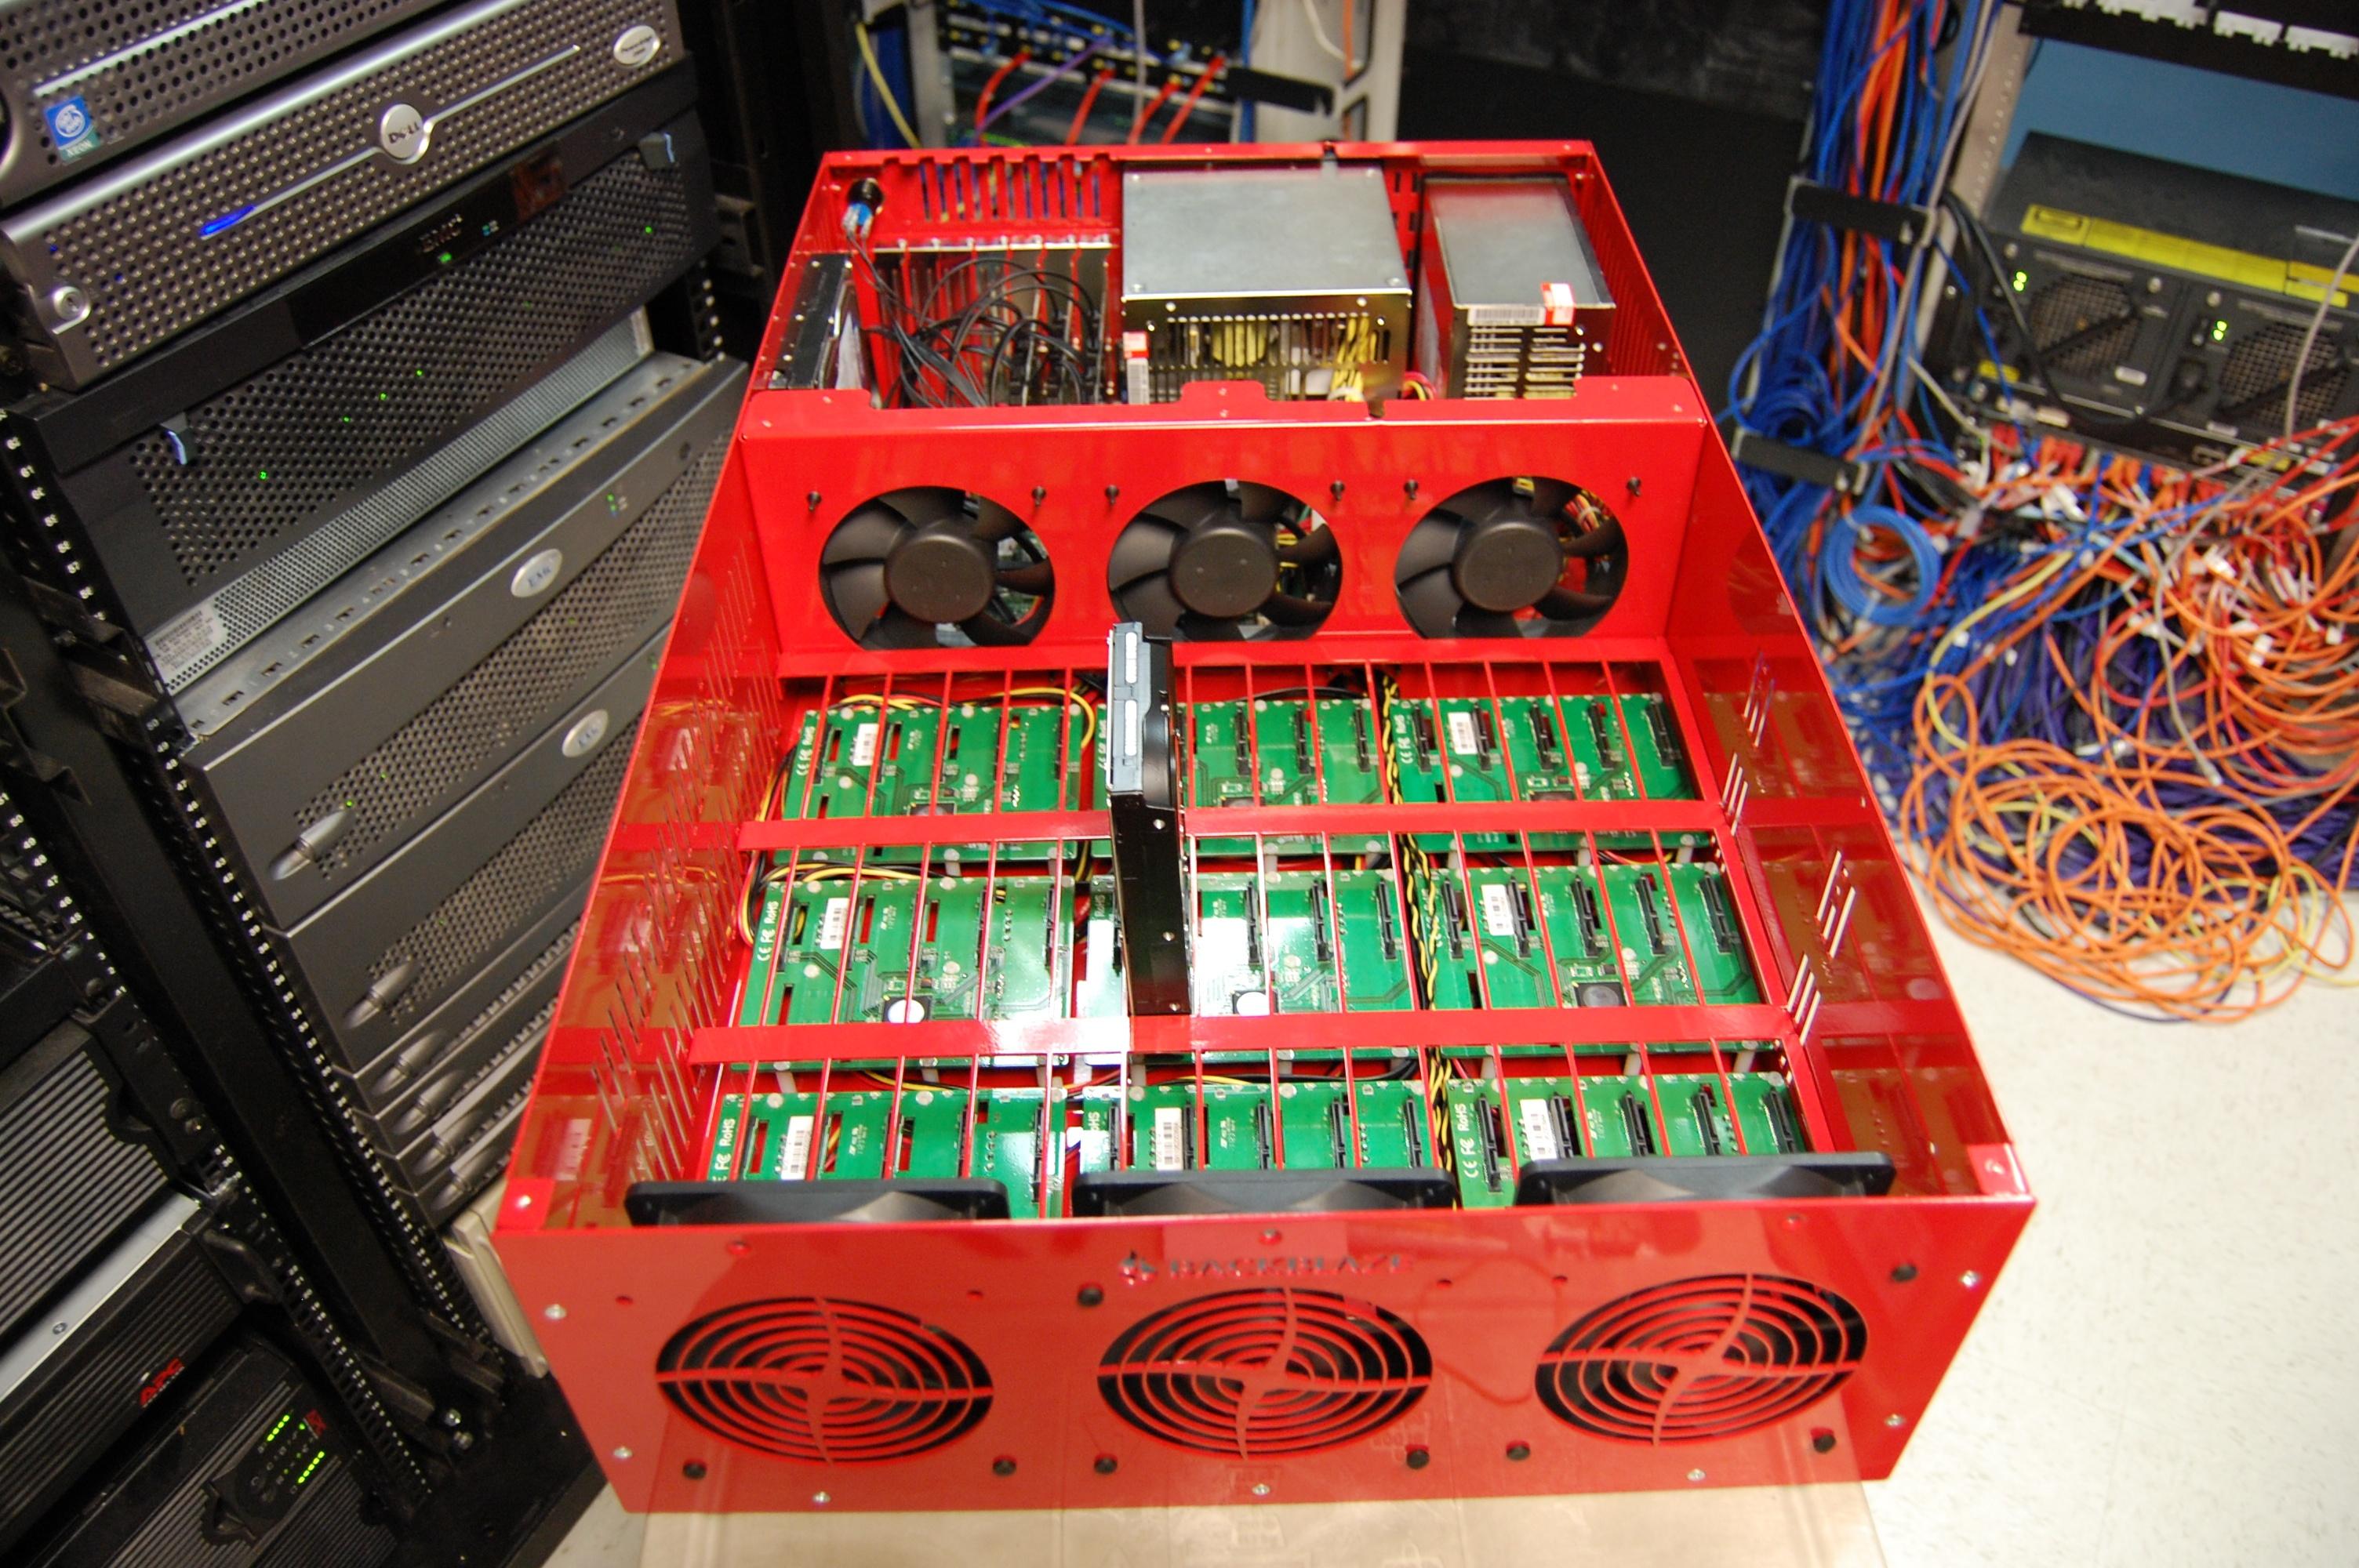 File Storagepod Backblaze 2 0 Exposed Jpg Wikimedia Commons